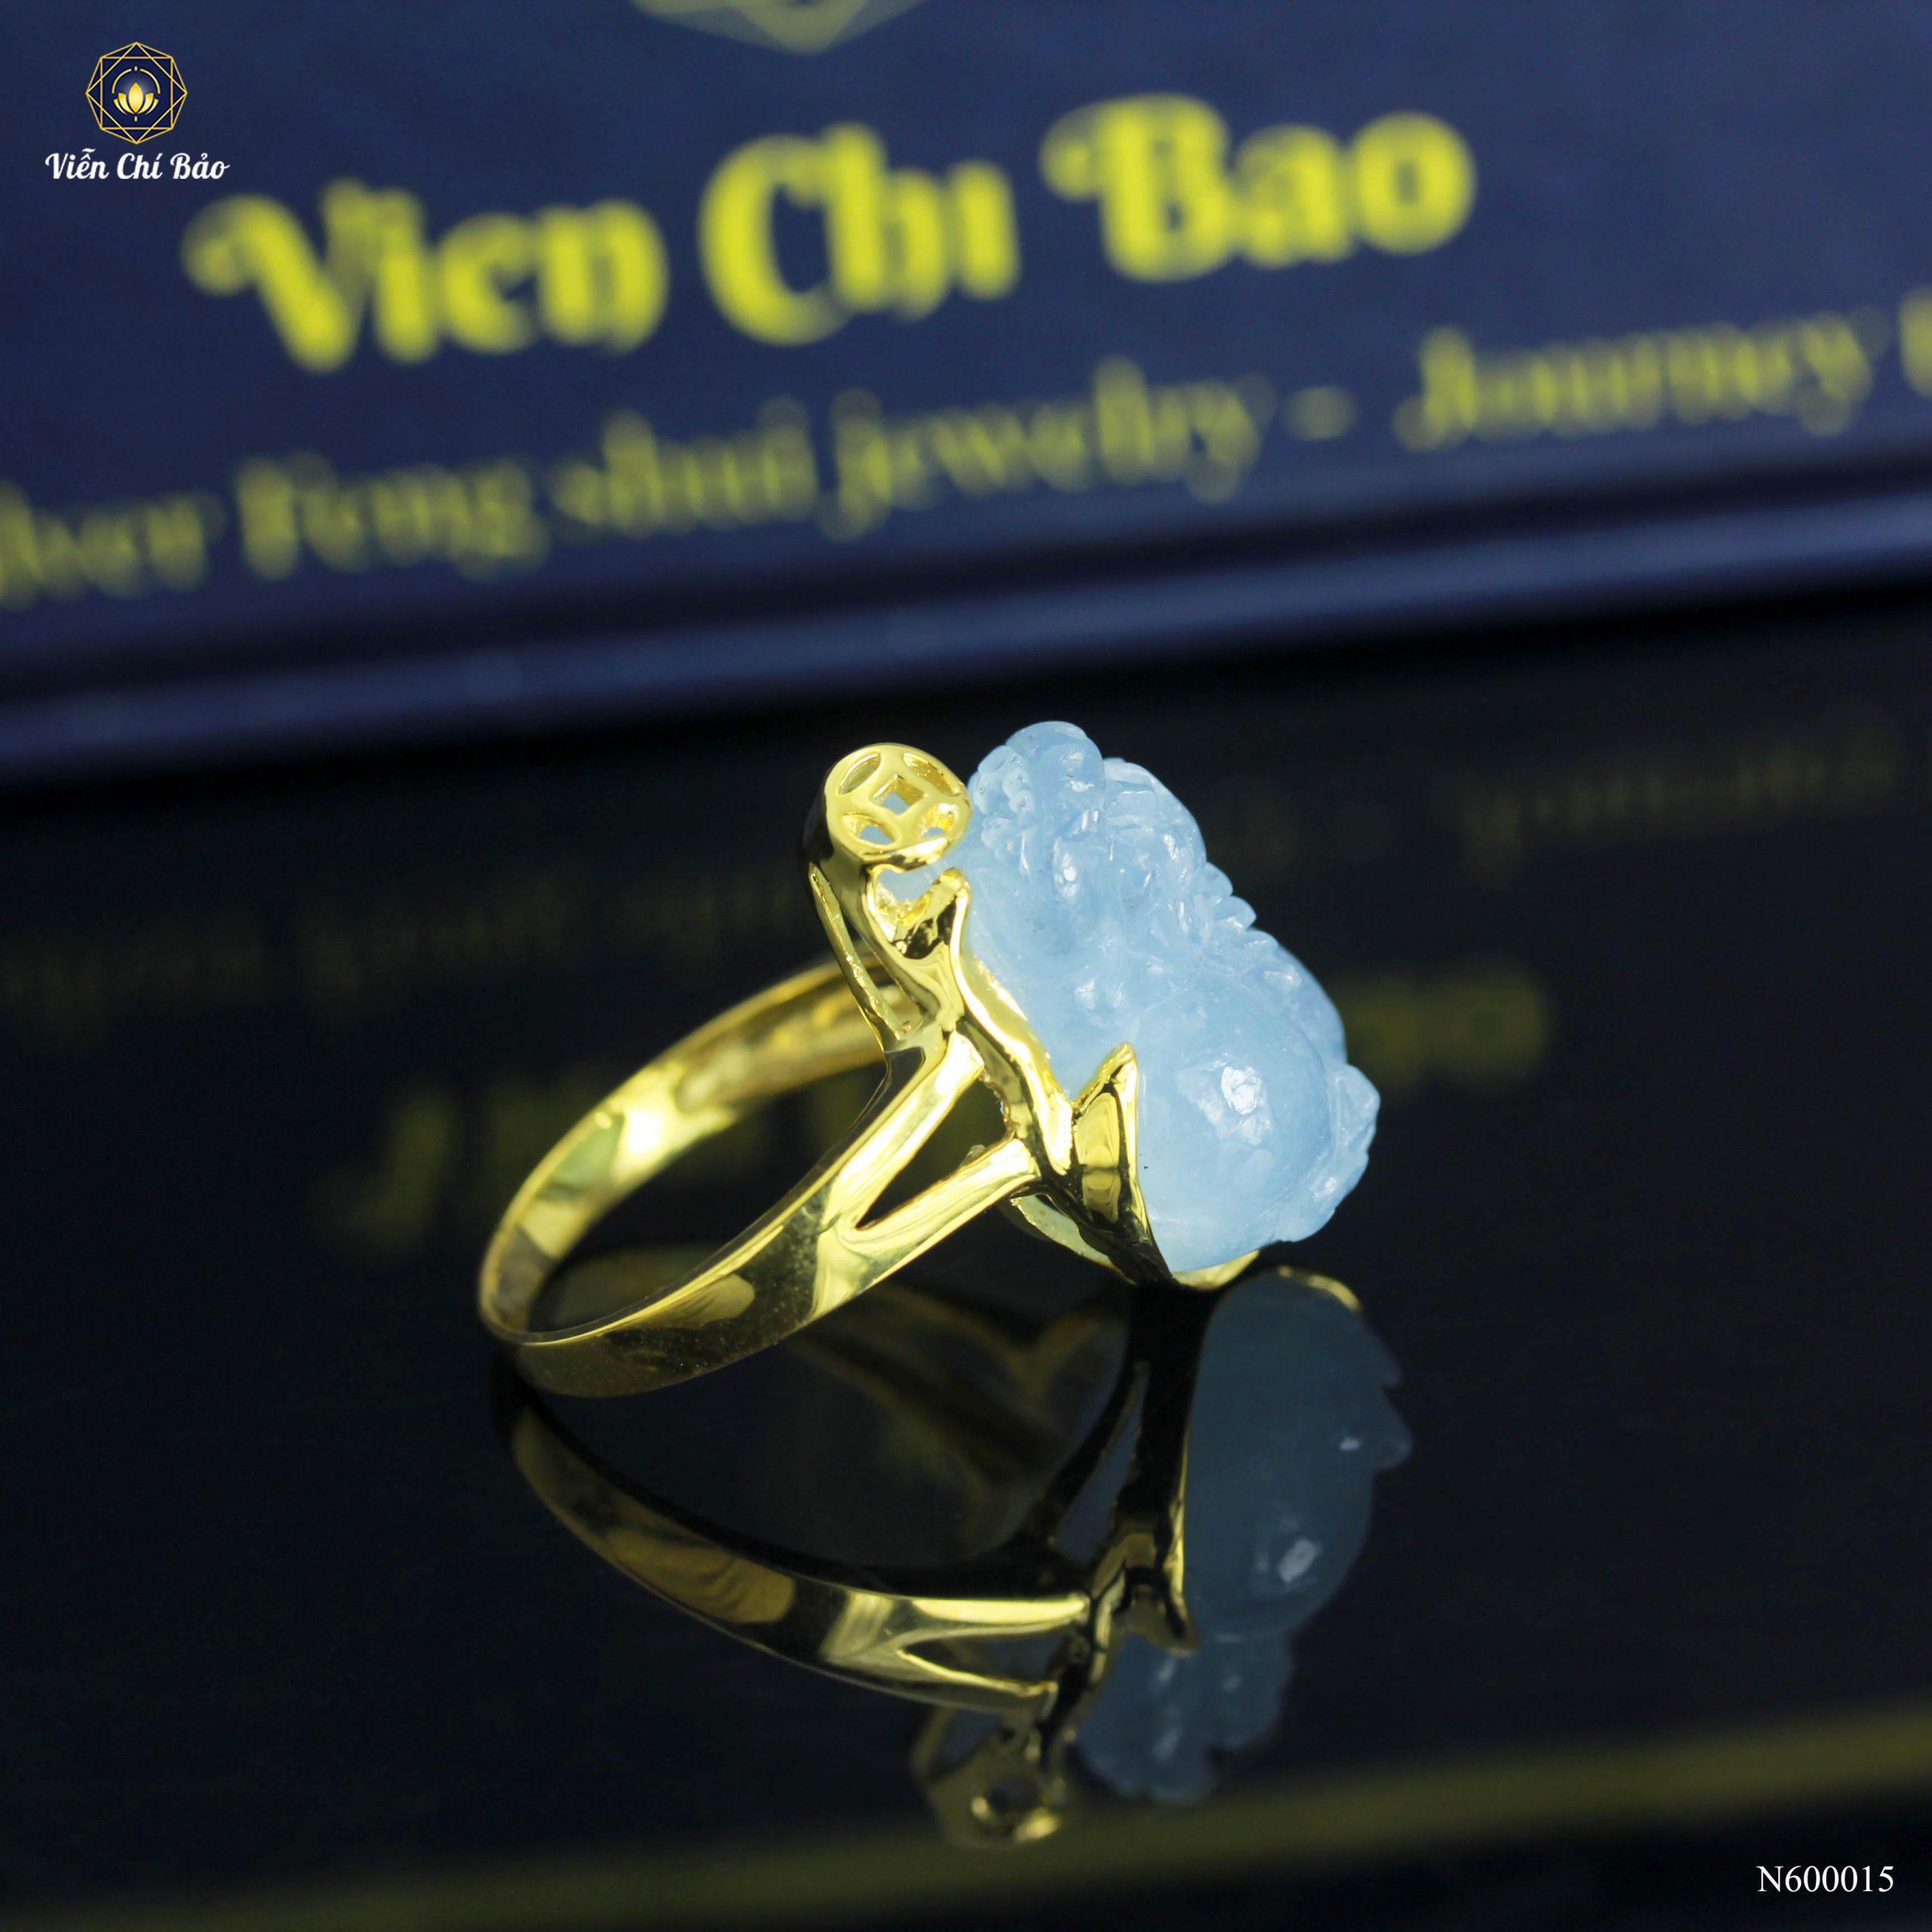 nhan-bac-nu-ty-huu-xi-vang-chat-lieu-bac-s92.5